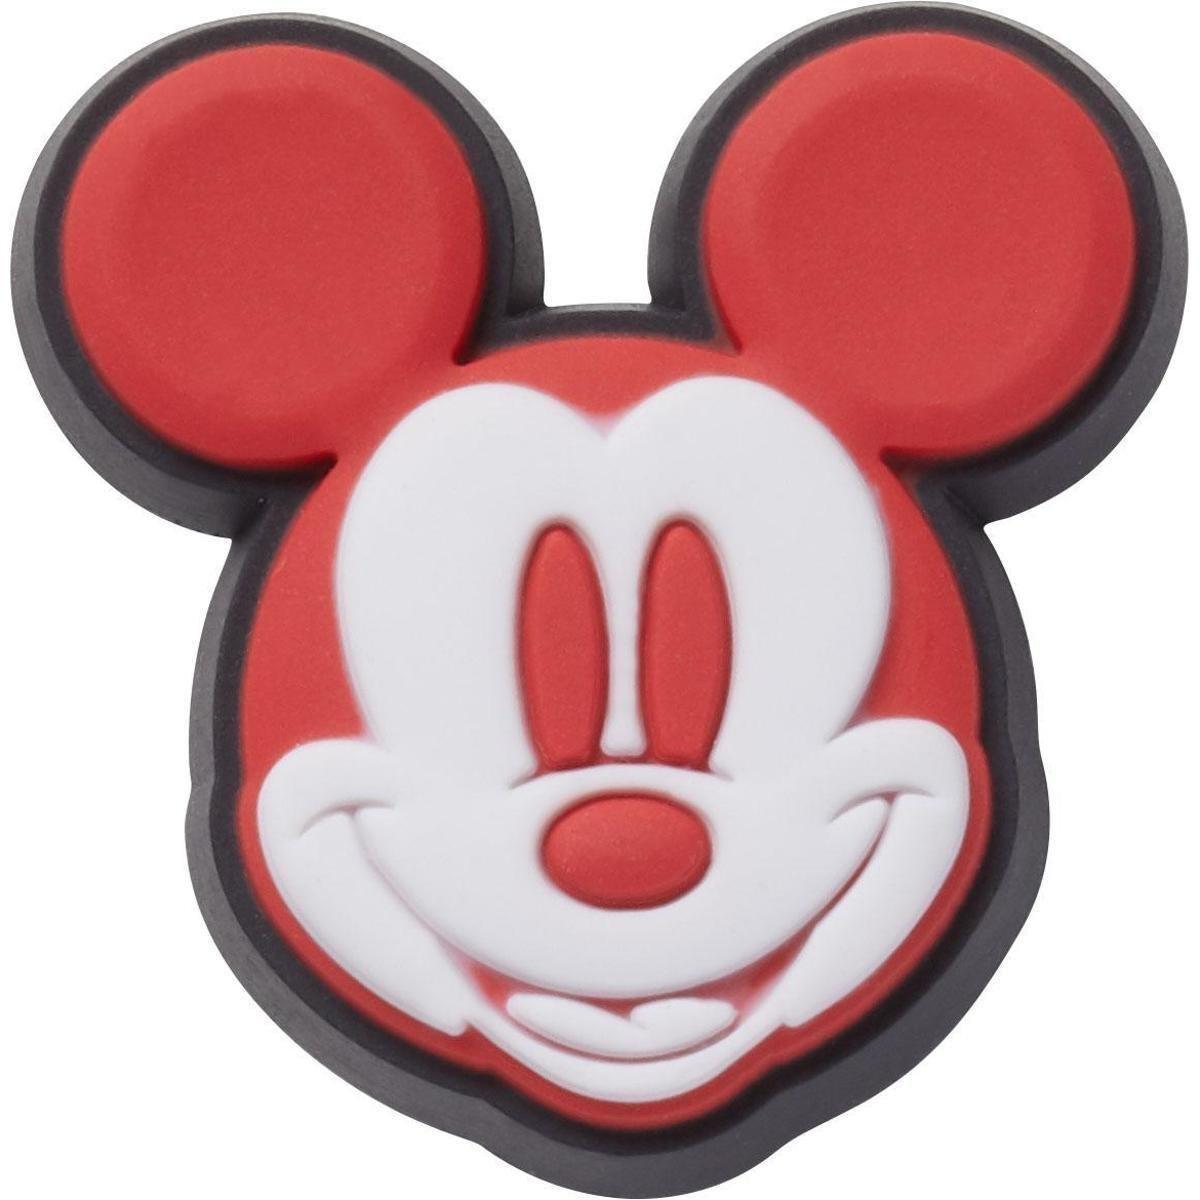 Jibbitz Crocs Disney Mickey Mouse